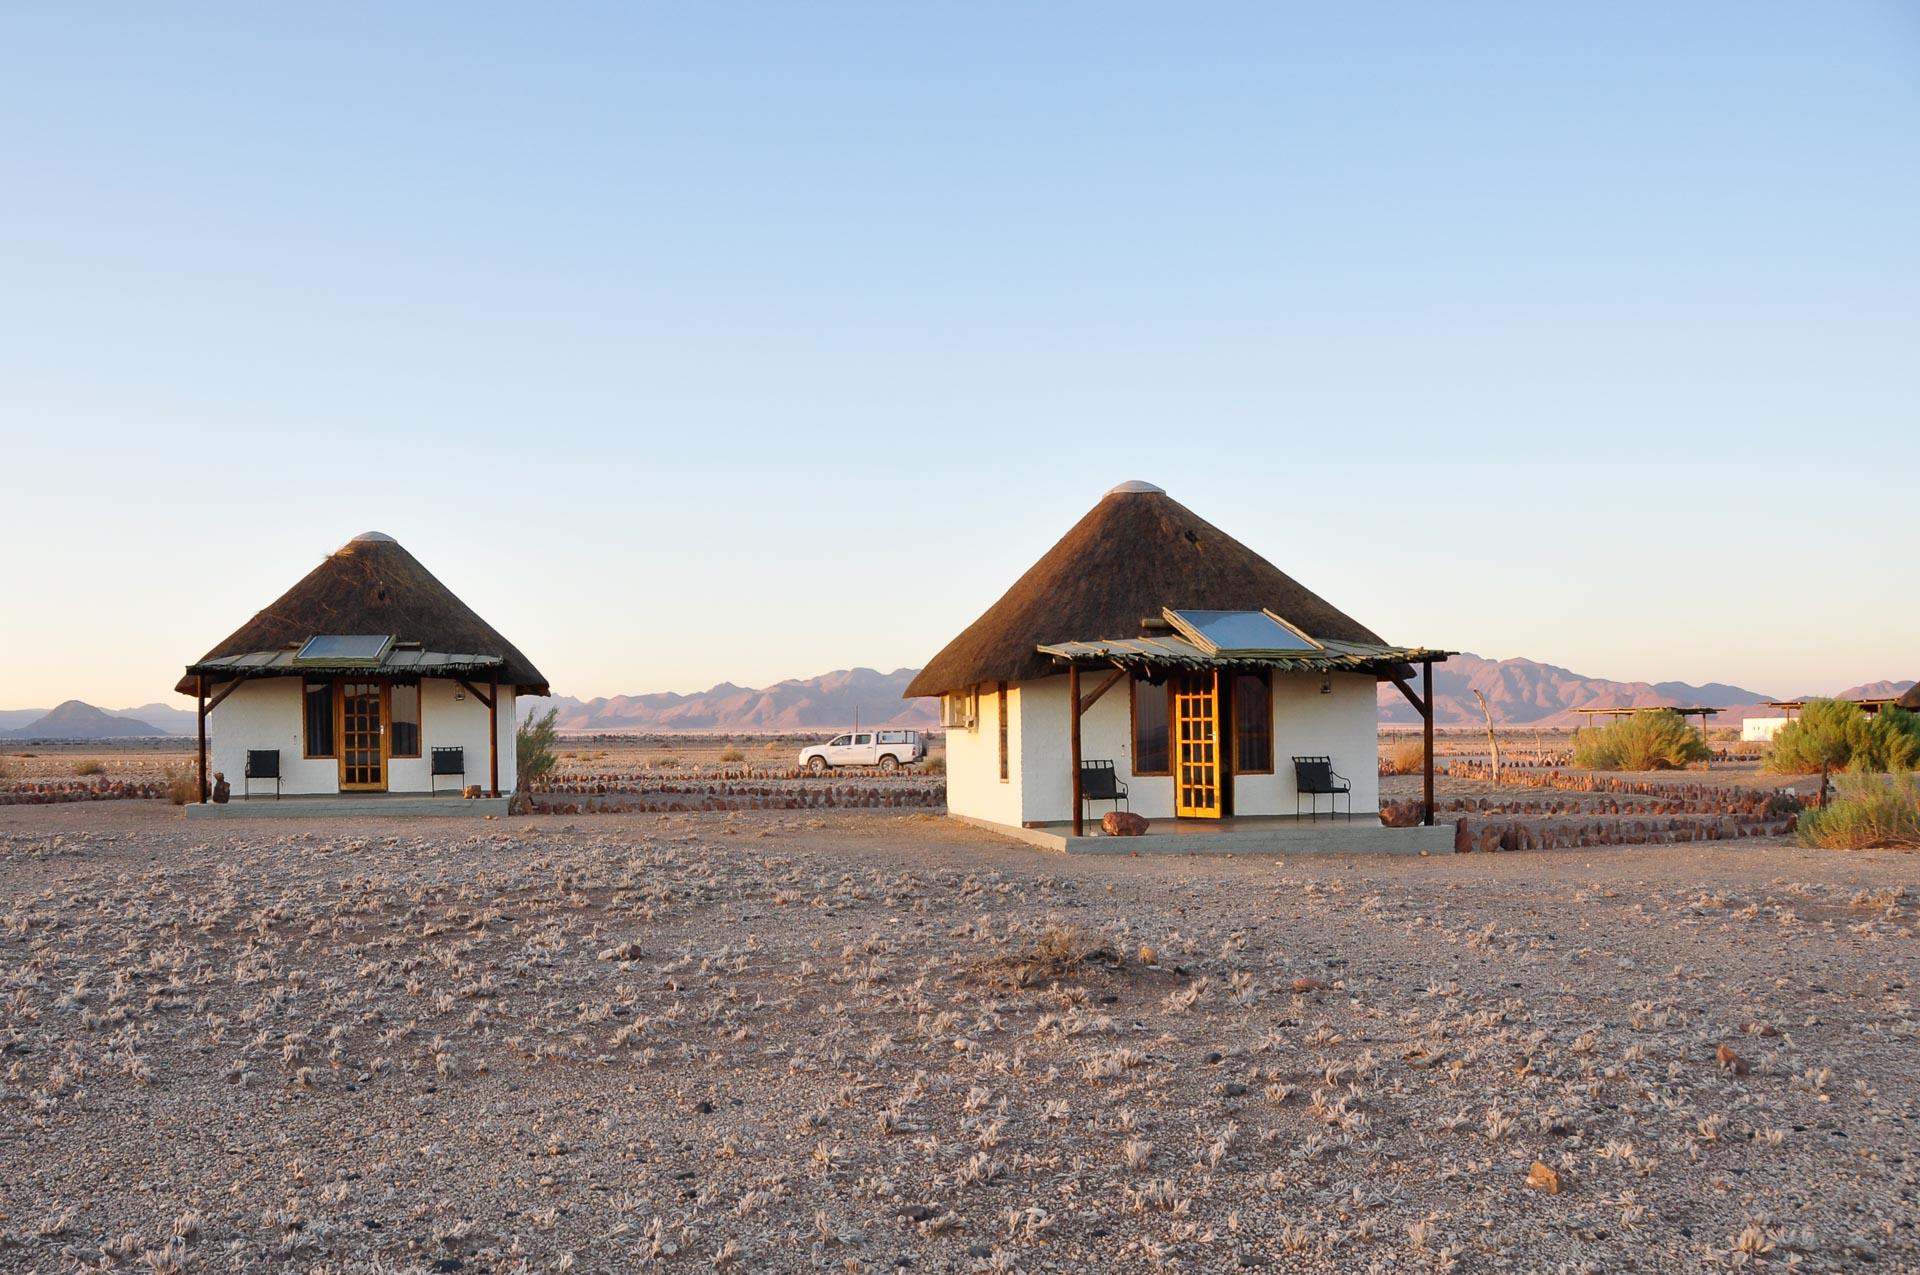 Deser-Homestead-Namibia-Globetrotter-Select-4